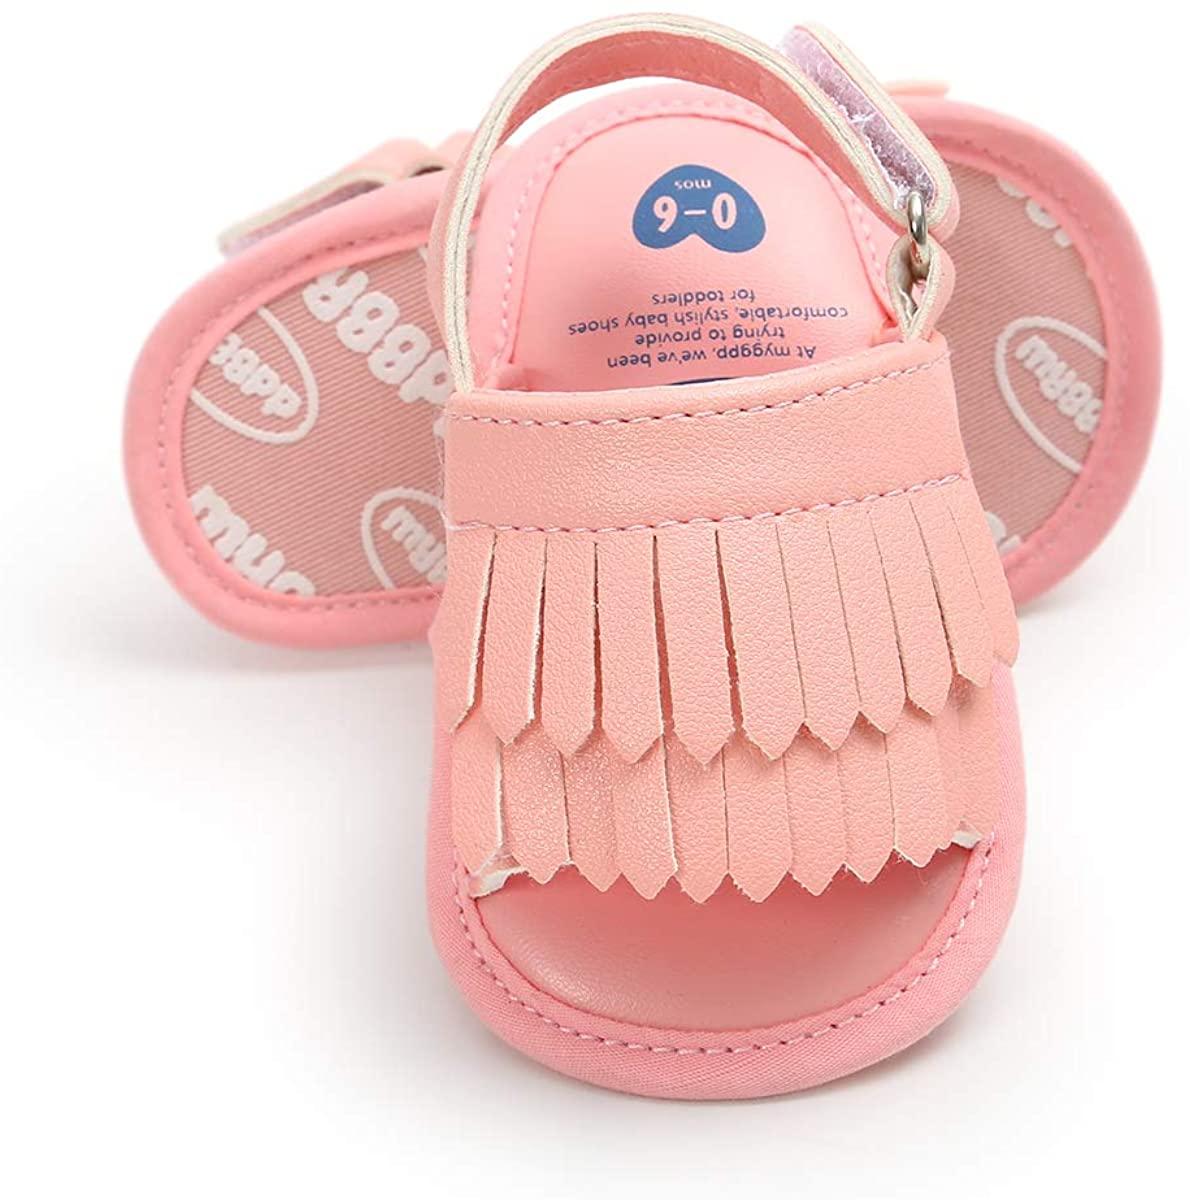 Sabe Unisex Infant Baby Summer Sandals Soft Sole Tassels Prewalker Anti-Slip Shoes